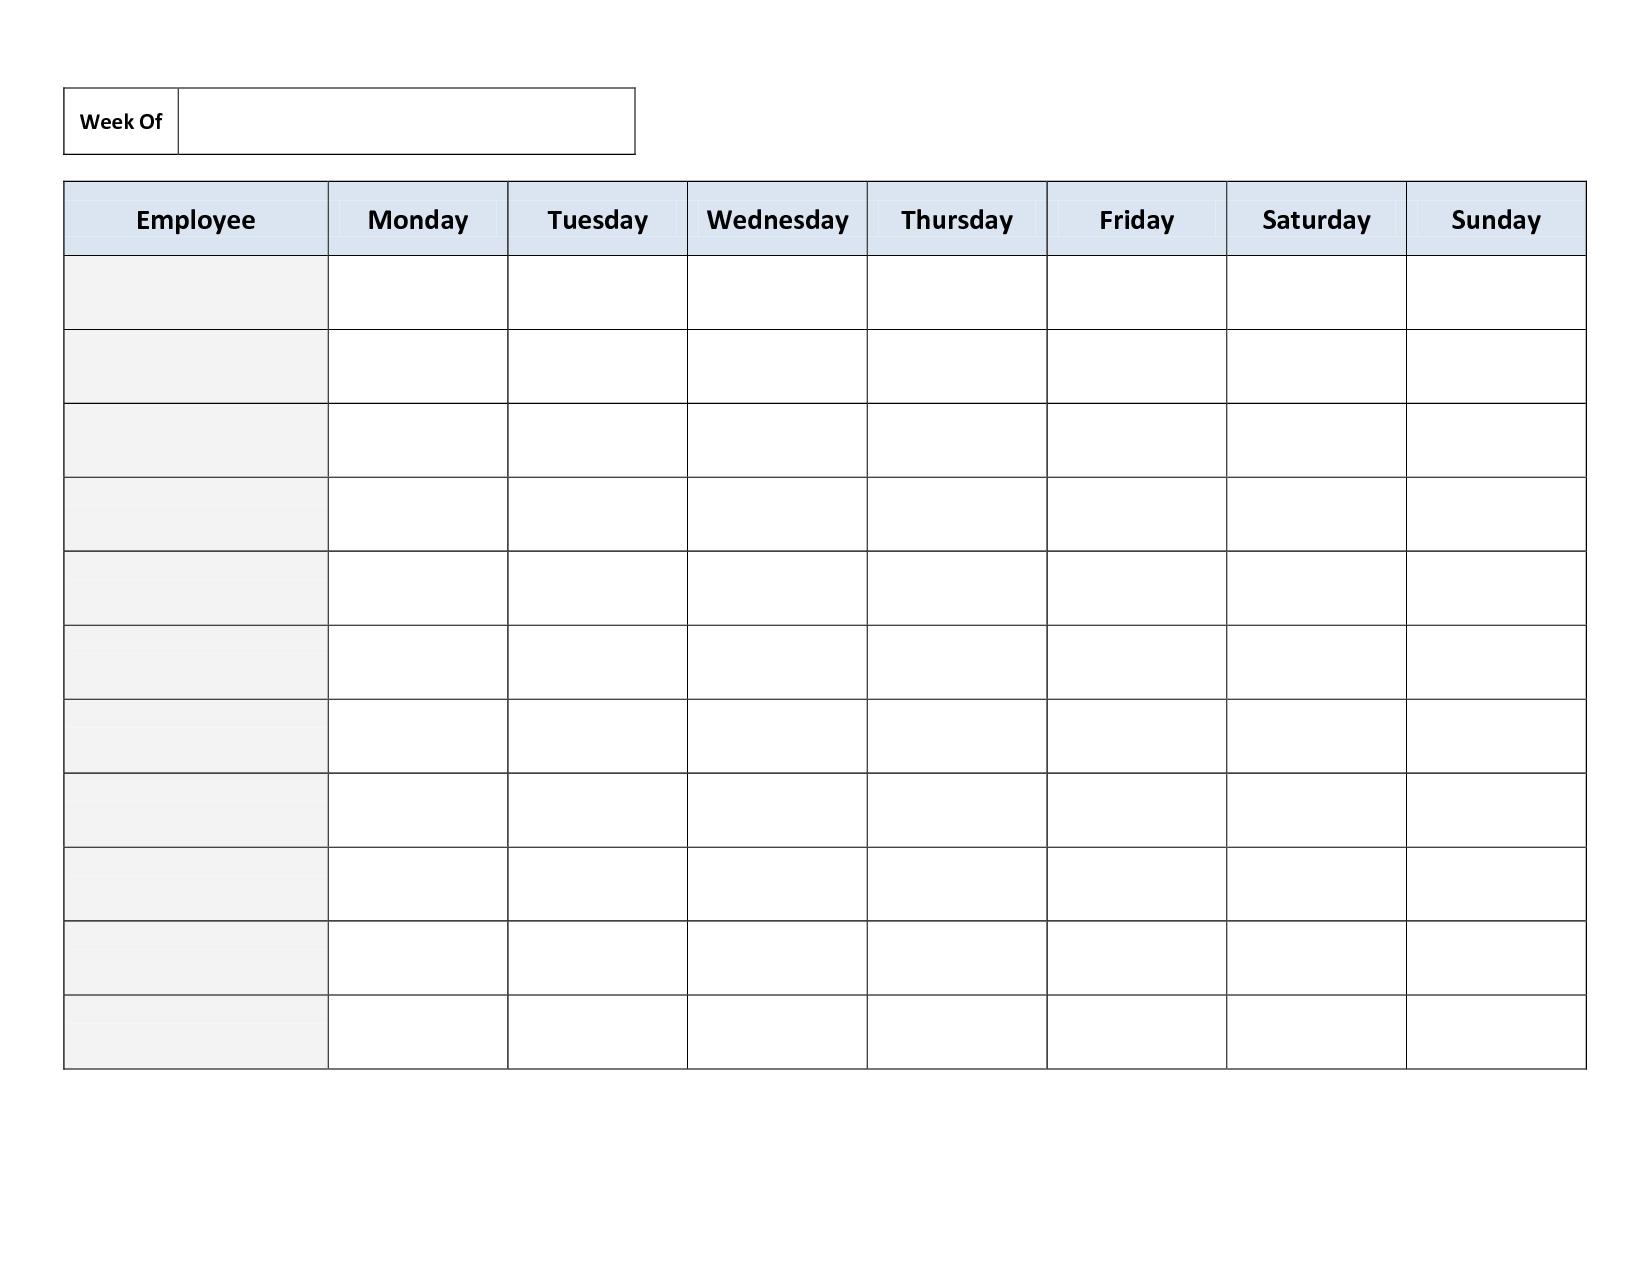 Blank Weekly Work Schedule Template | Schedule | Cleaning Schedule - Free Printable Work Schedule Maker